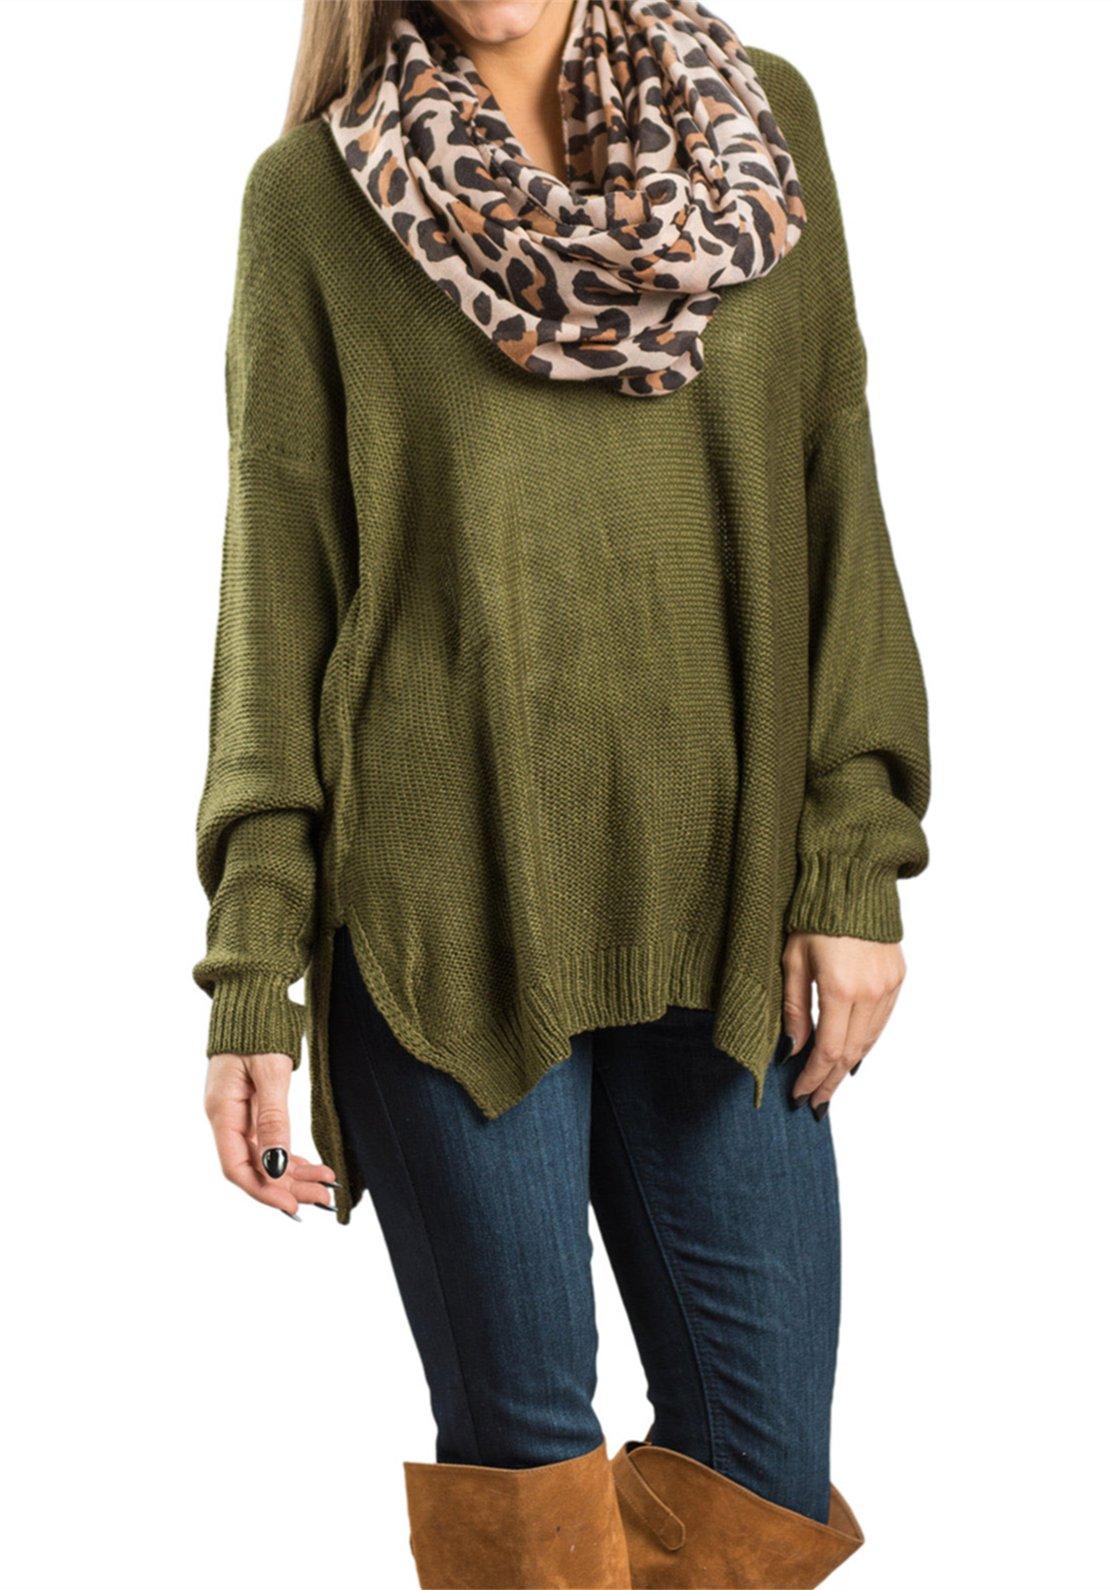 AMAURAS Size 4-34 Women Loose Sweater Top Casual V Neck Shirt Ladies Long Sleeve Tunic